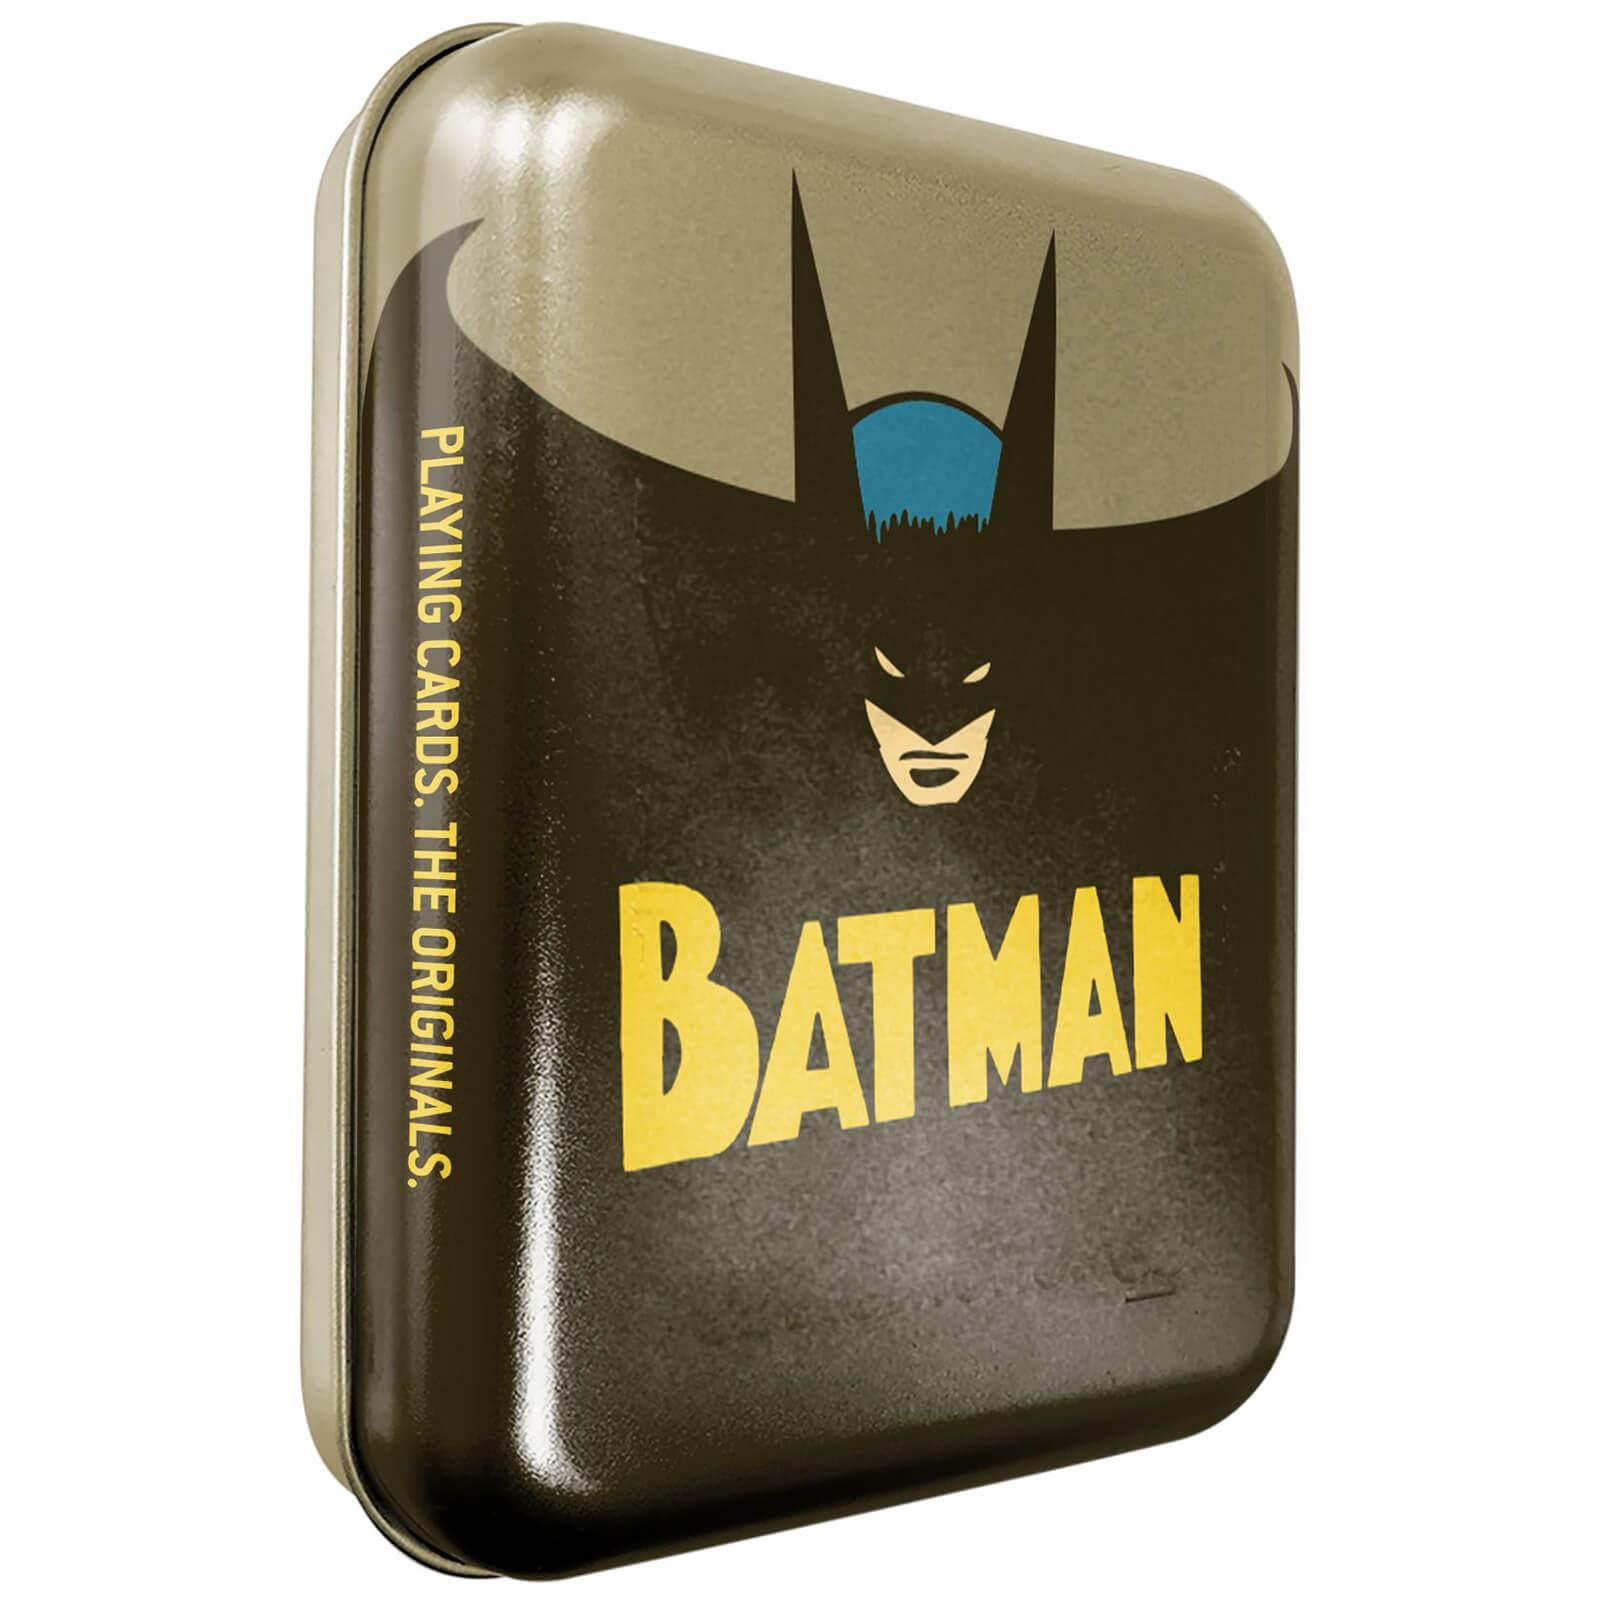 Image of DC Batman Collector Playing Cards & Tin